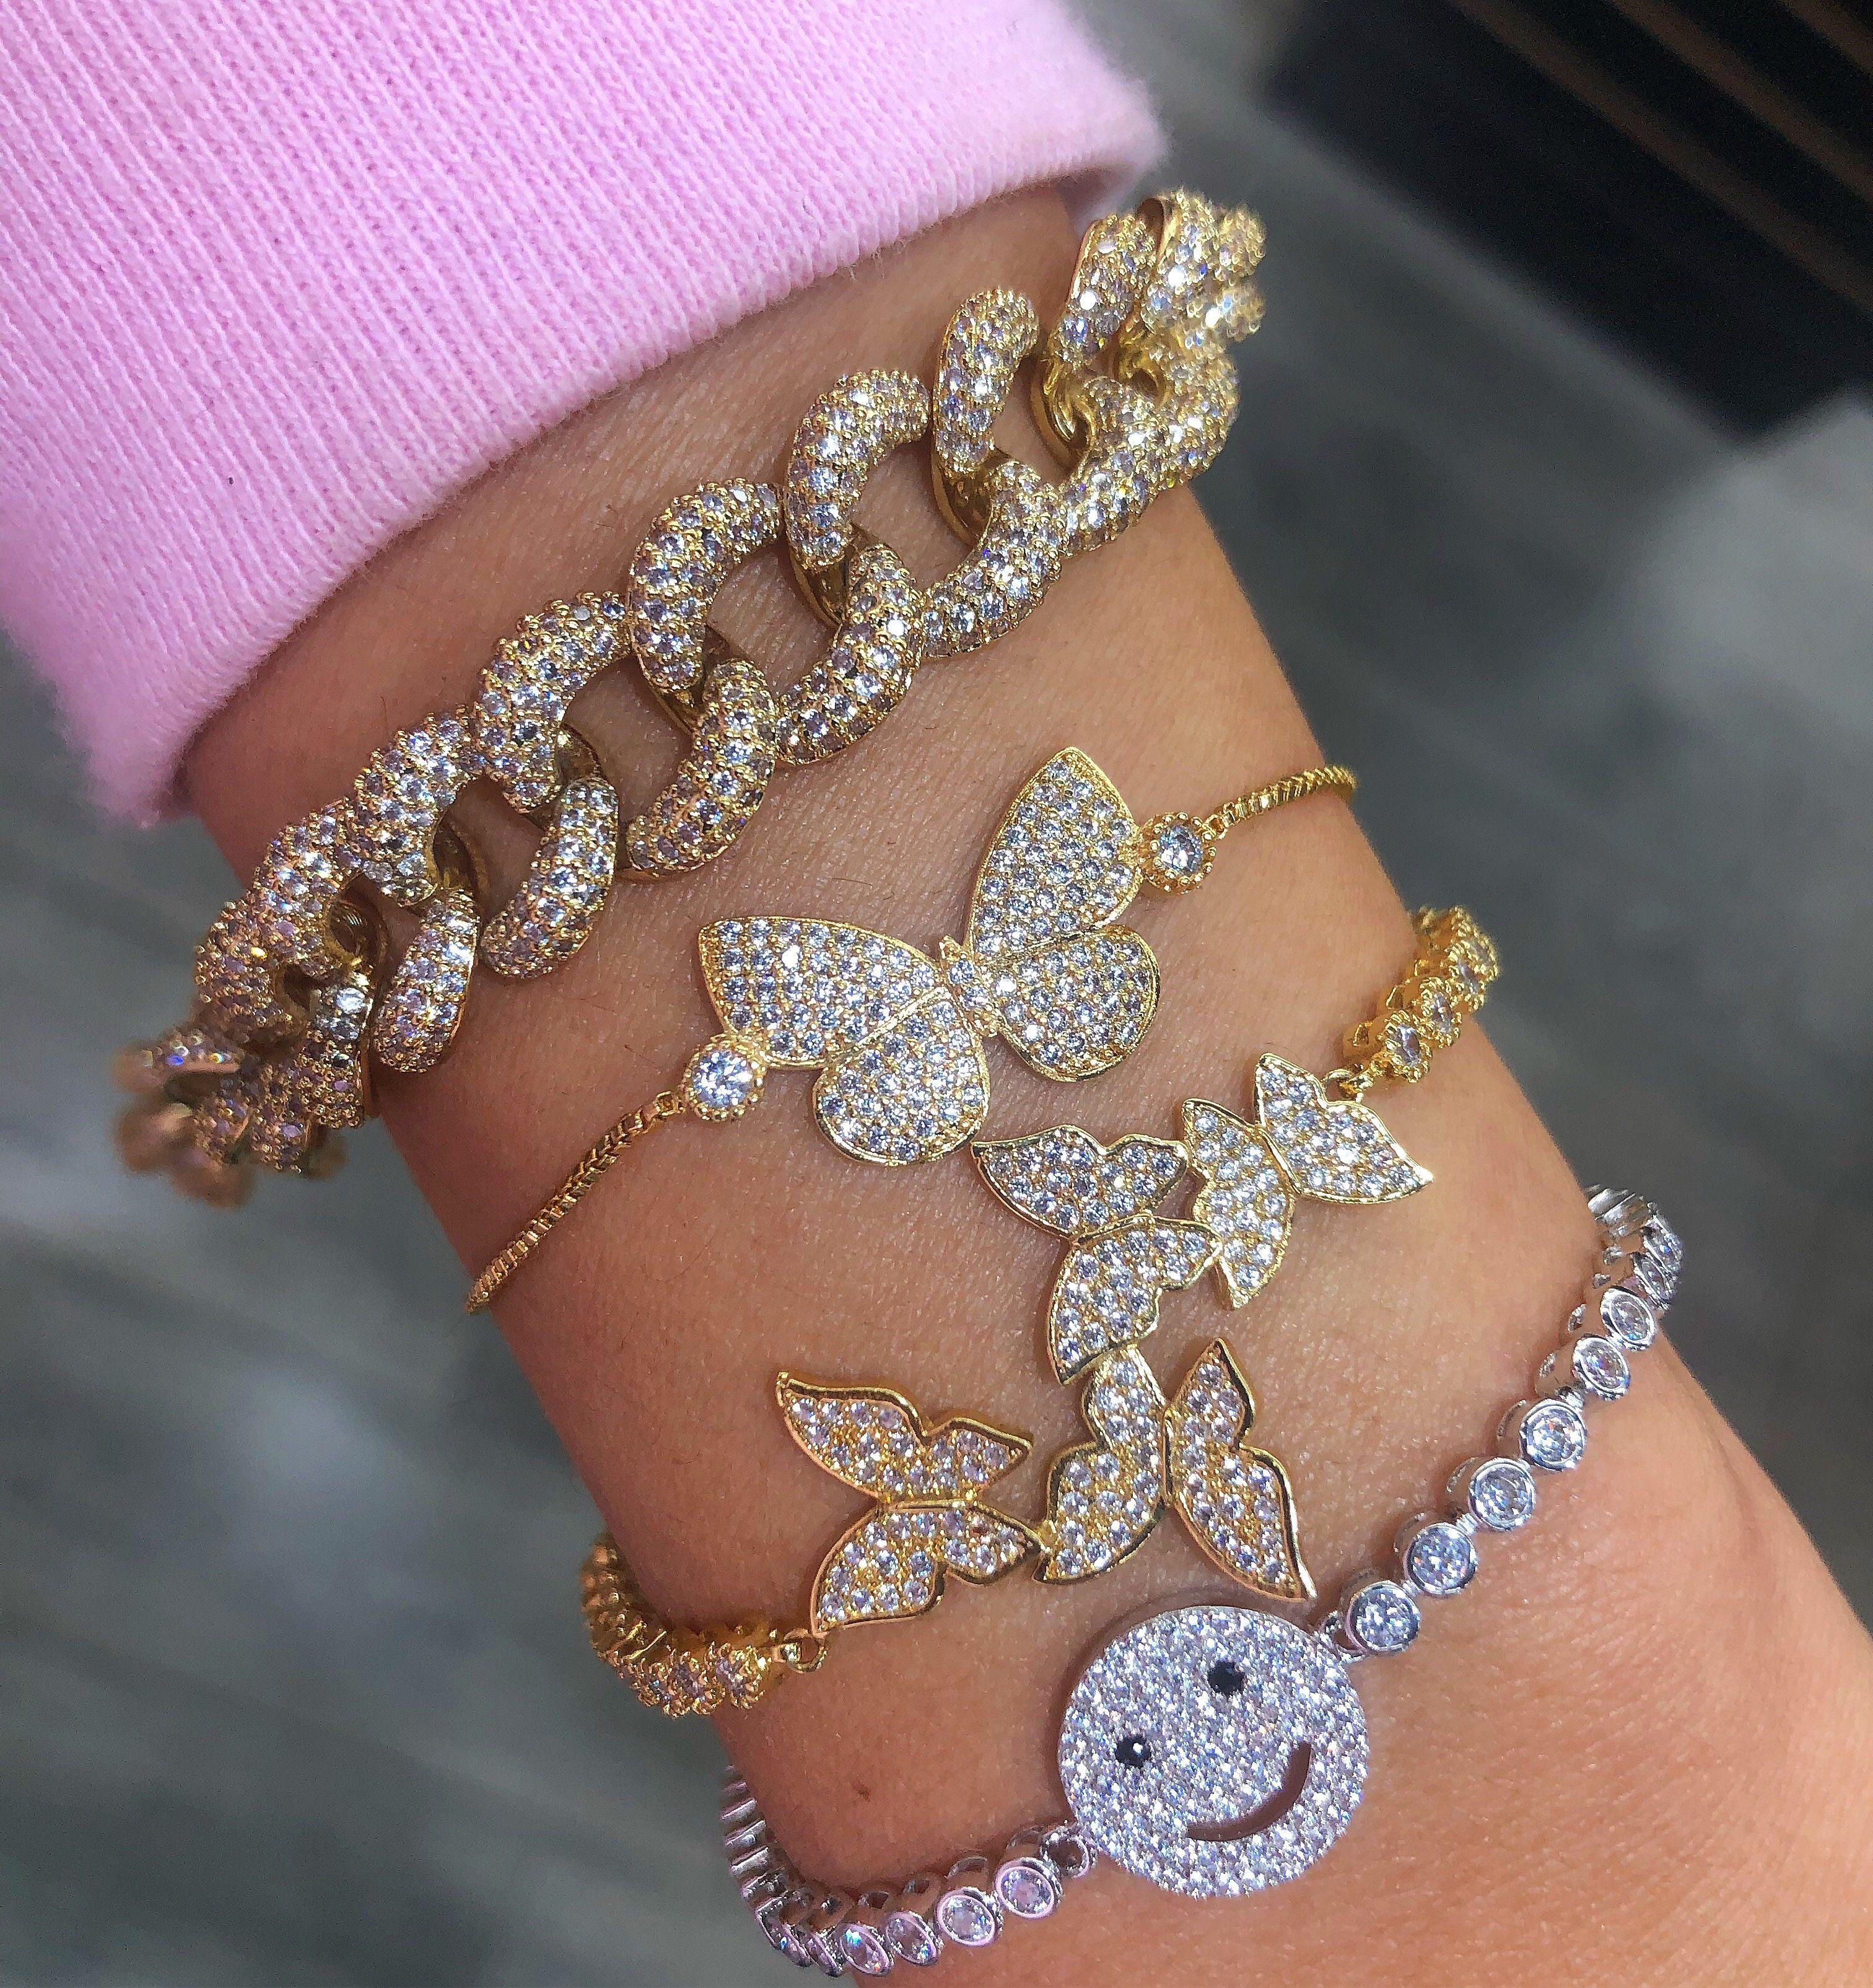 New Women Silver Metal Rhinestone Butterfly Bling Charm Fashion Headband Jewelry